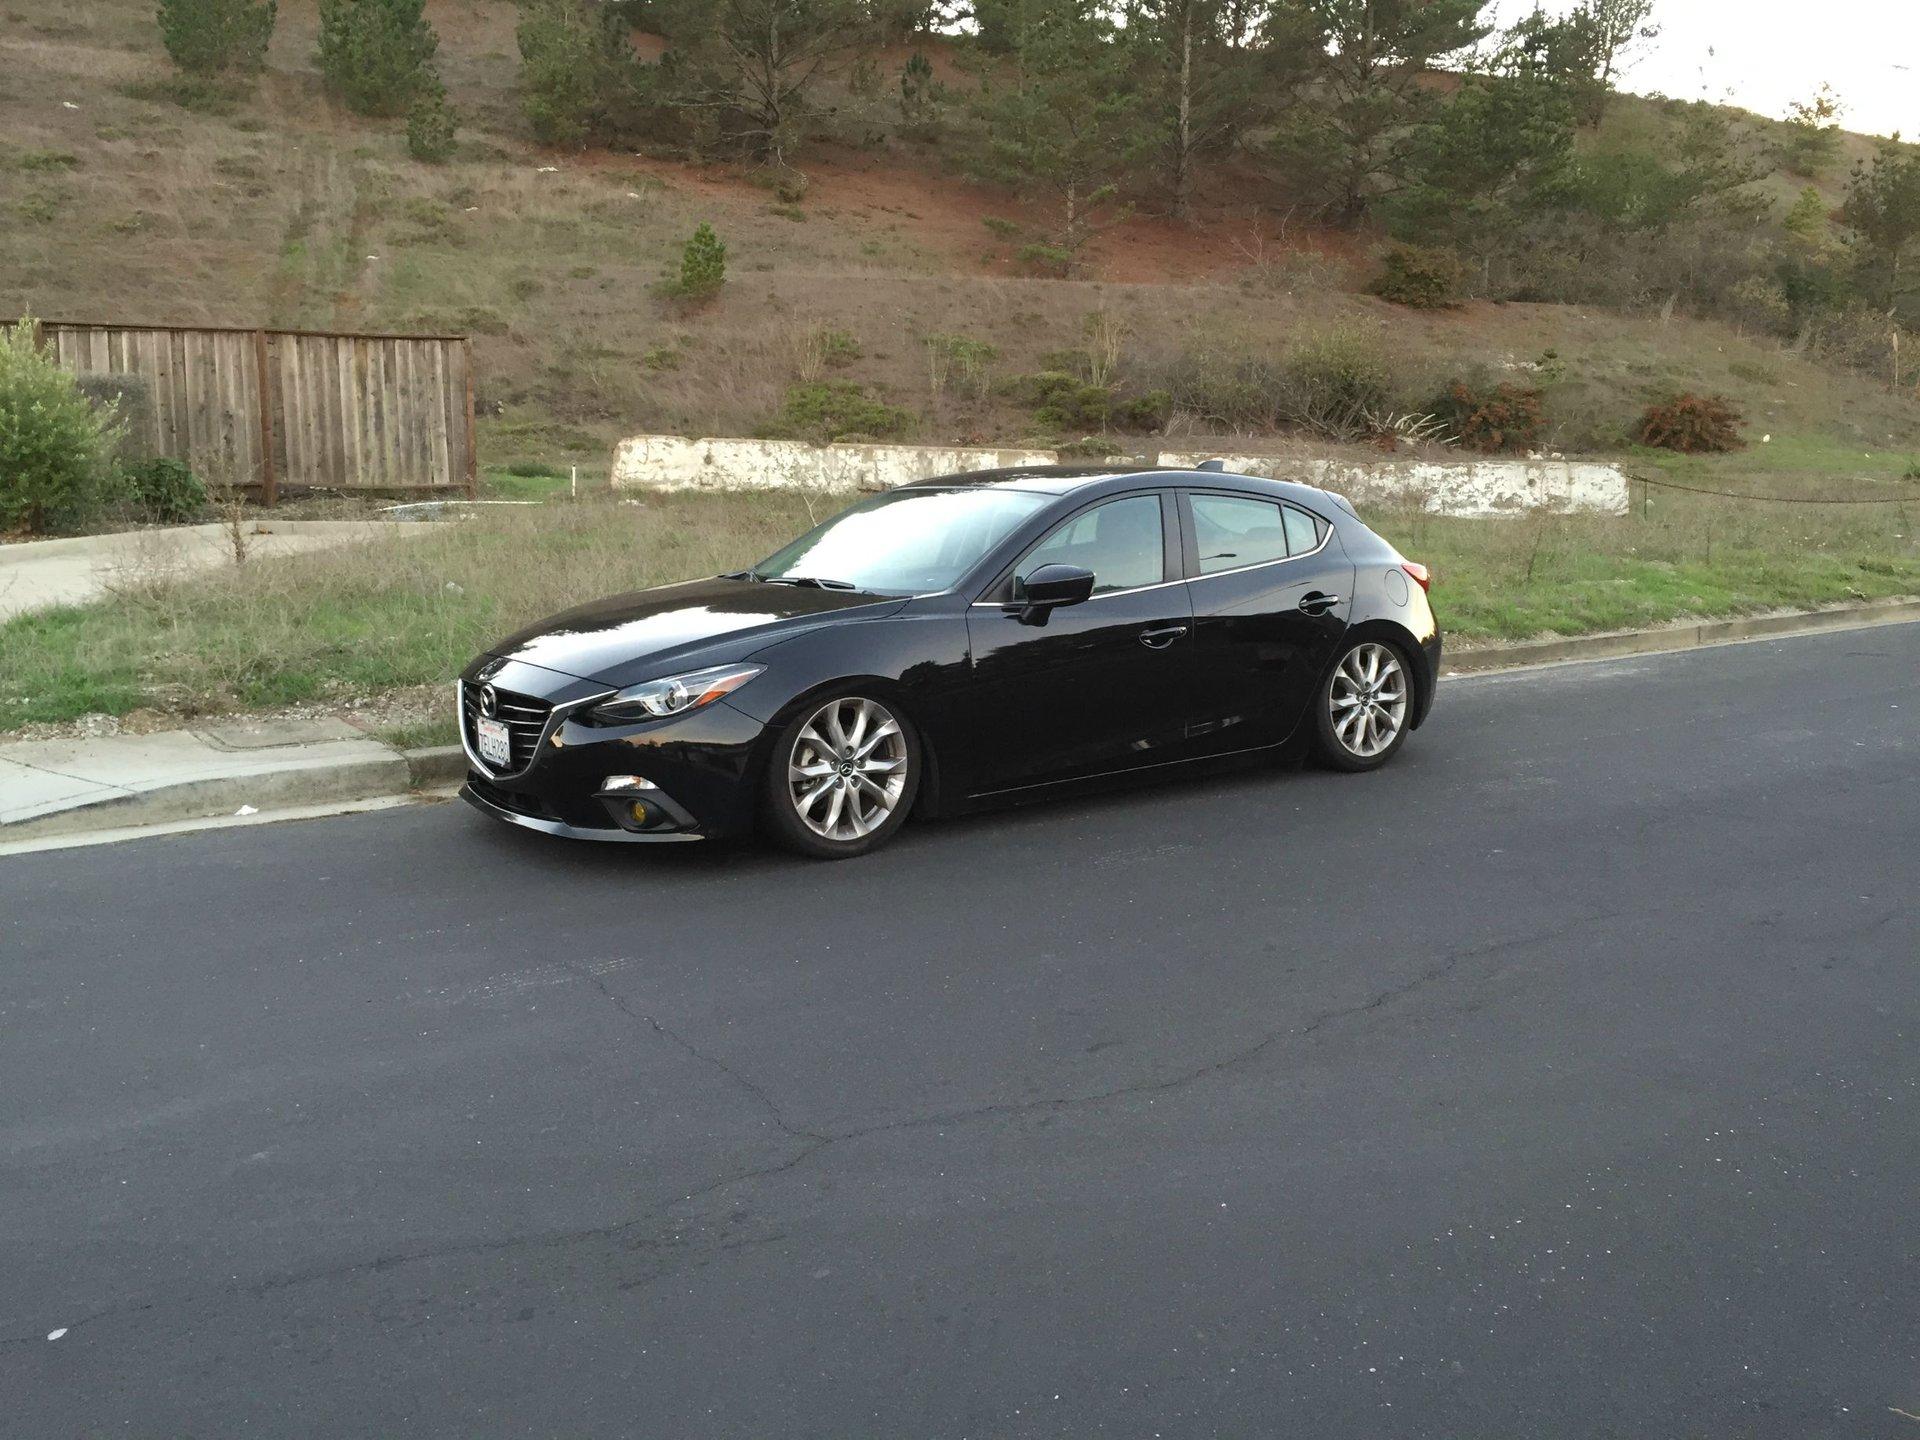 Mazda 3 Forum >> Mazda3 On Air Suspension 2004 To 2016 Mazda 3 Forum And